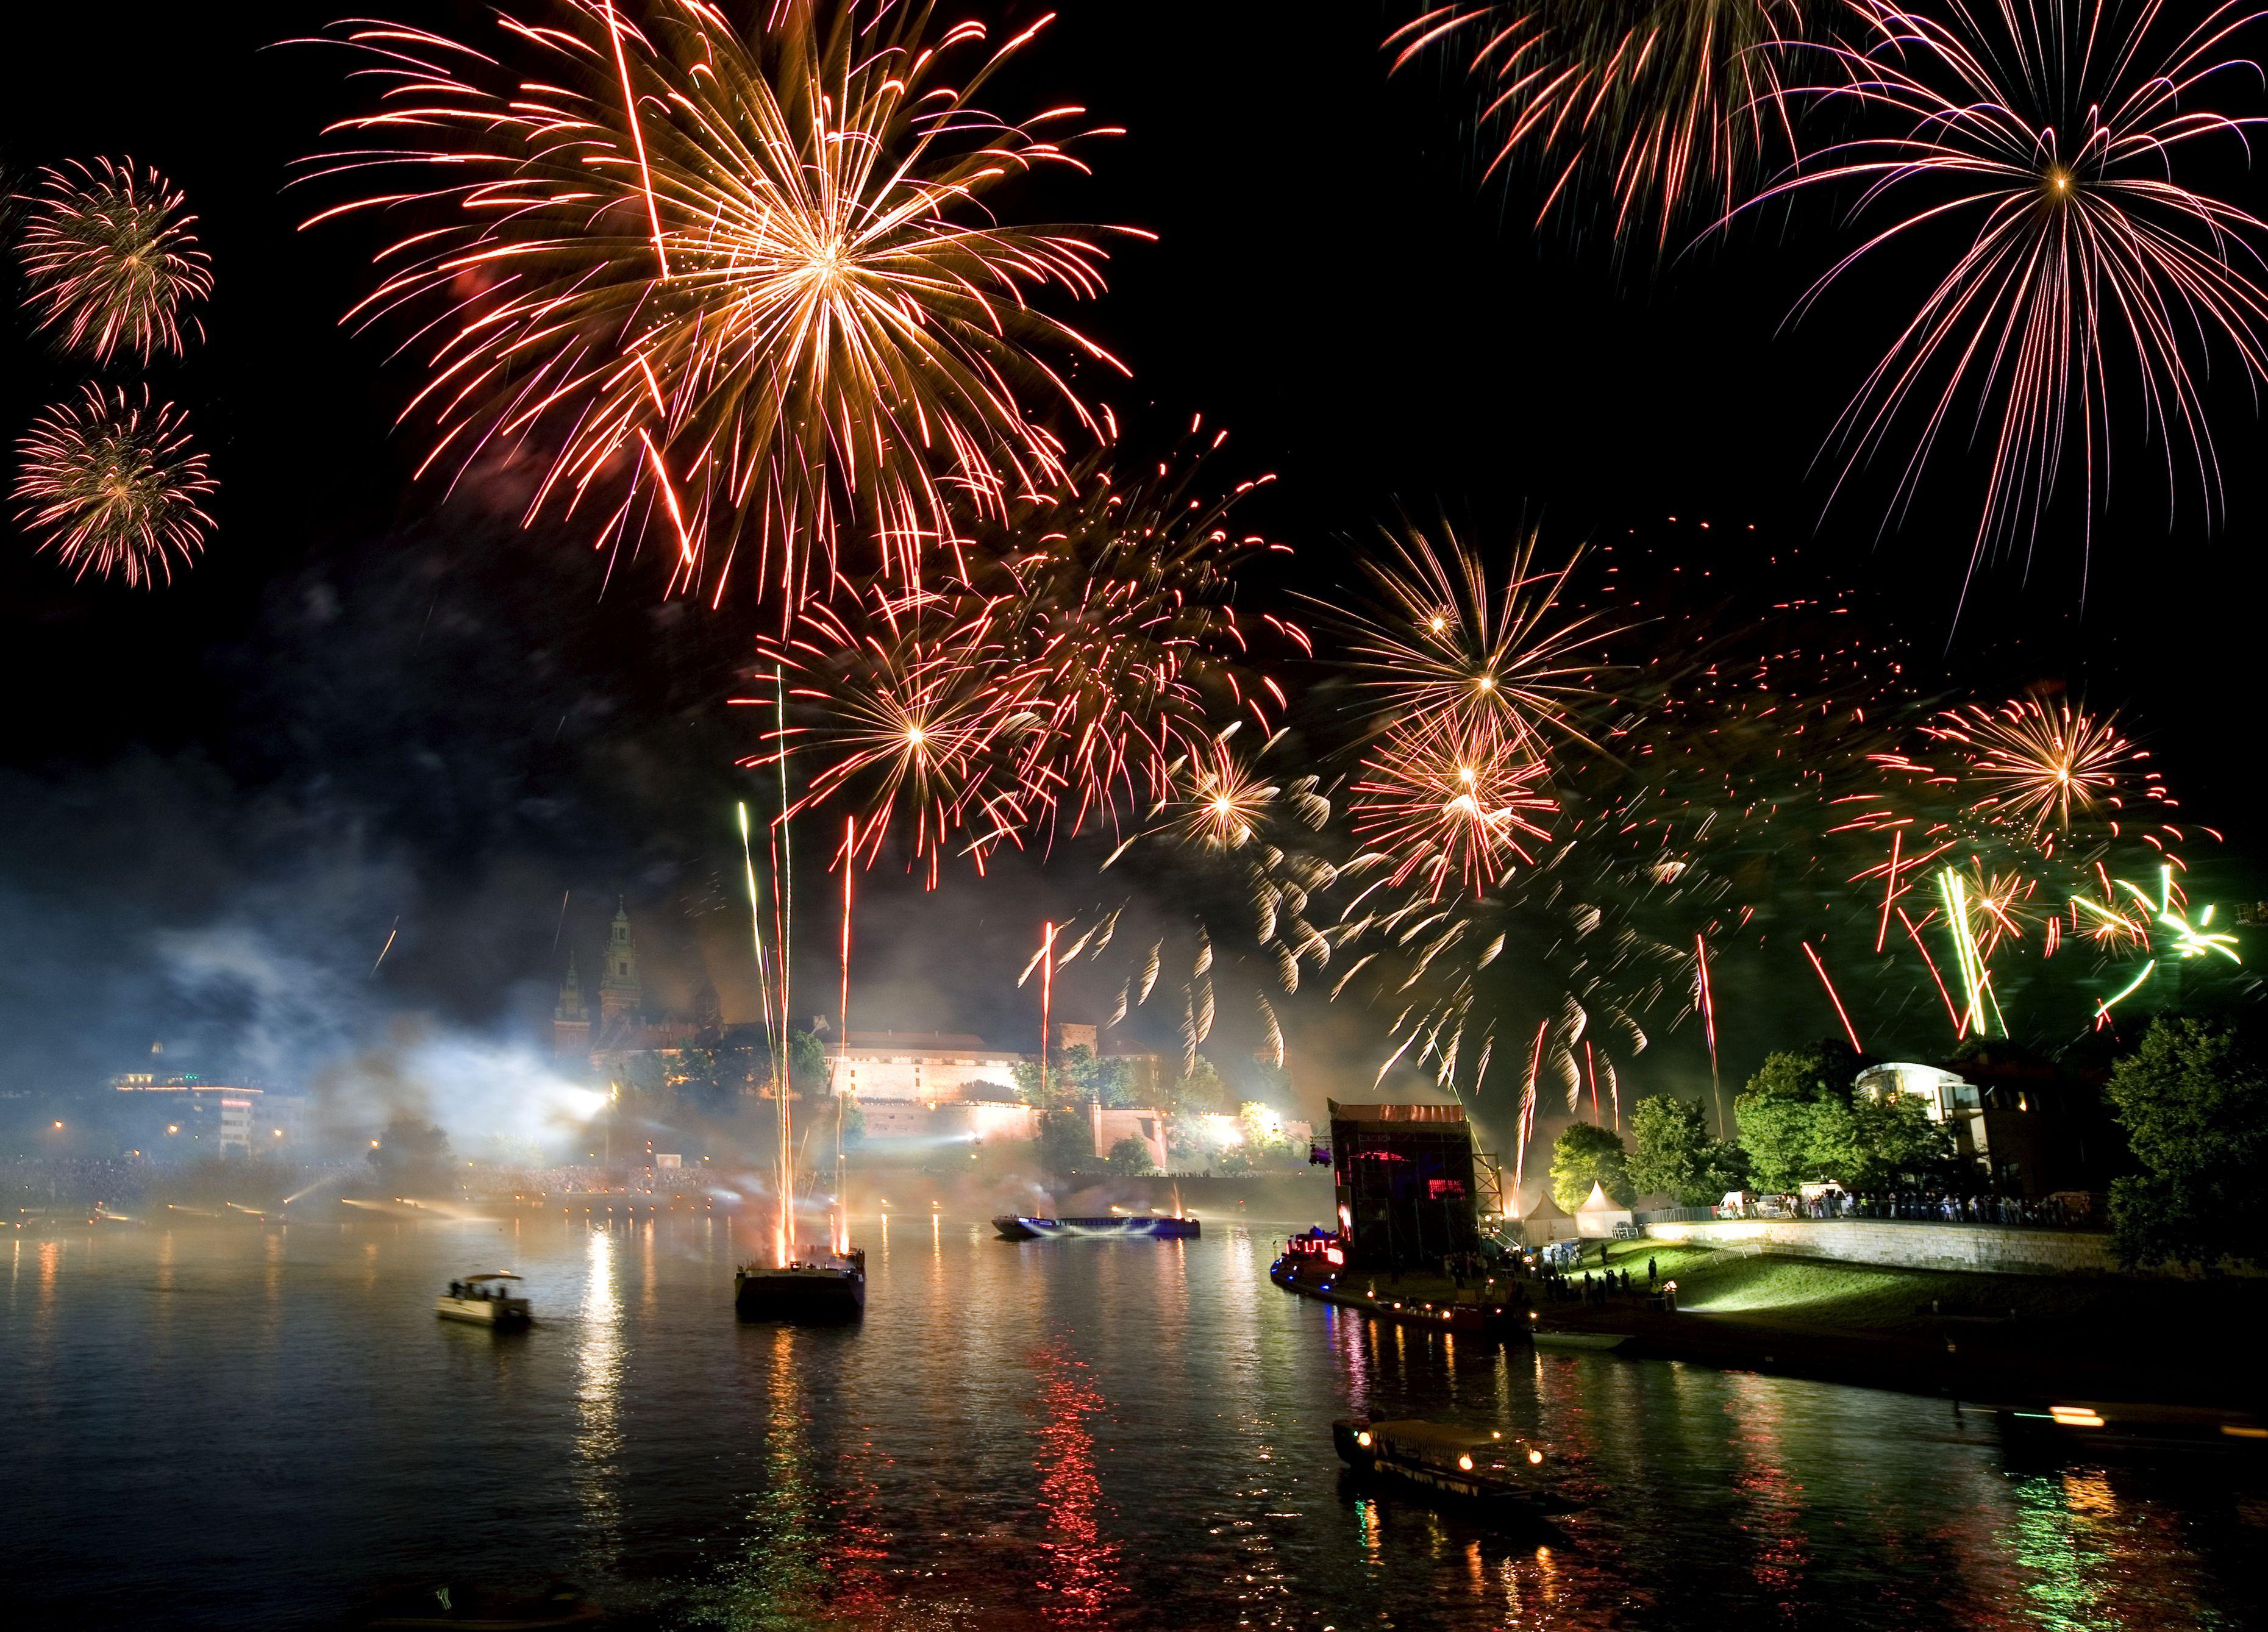 Poland, Krakow, Wianki, Annual festival held on St John's night on the Vistula River by Wawel Hill